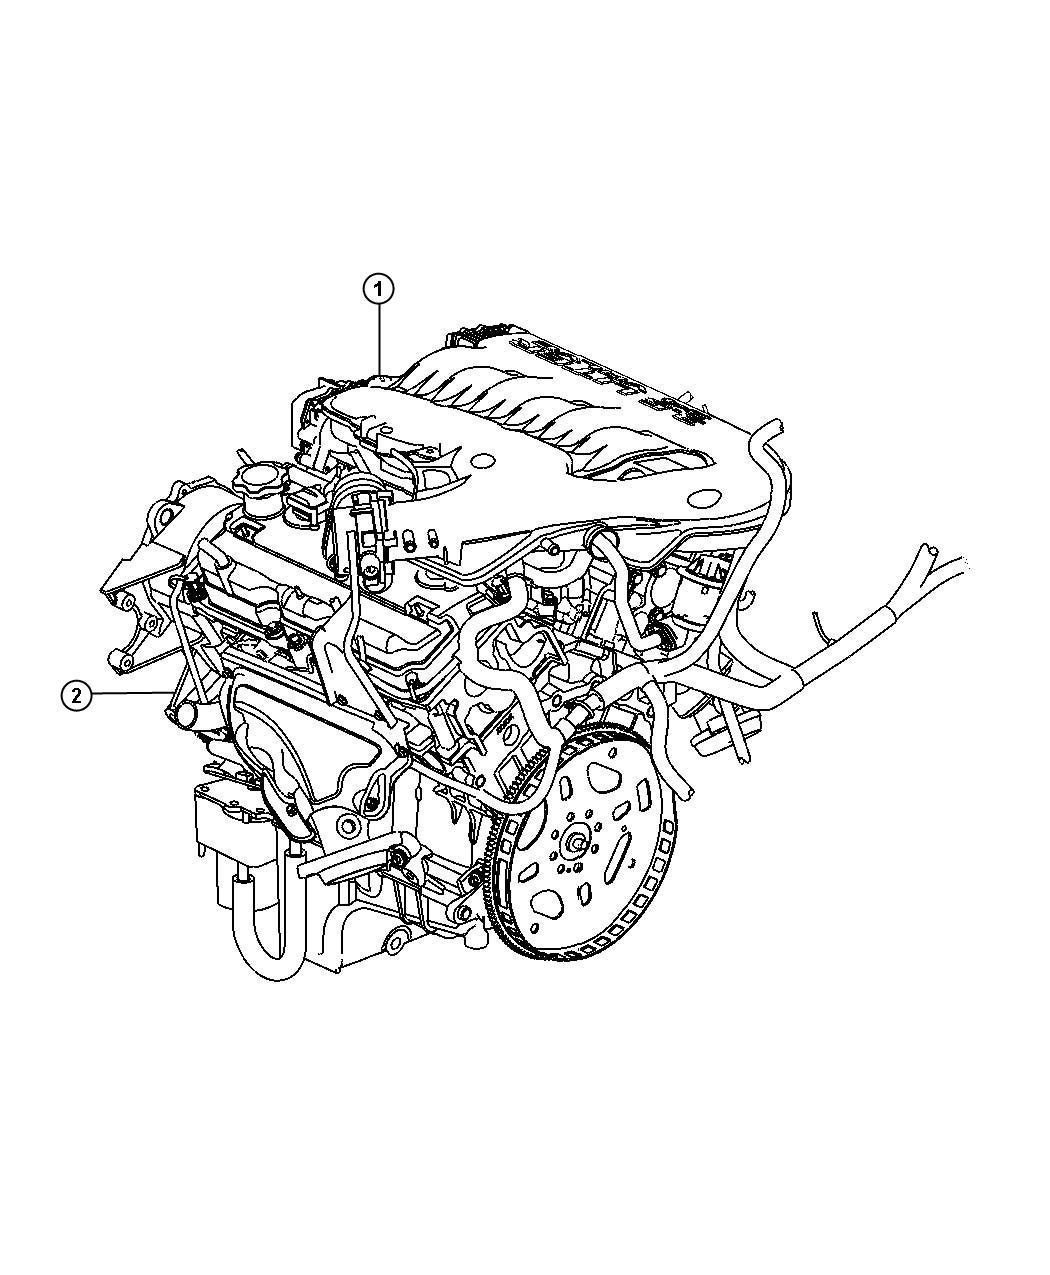 Chrysler 300 Engine  Long Block  Export